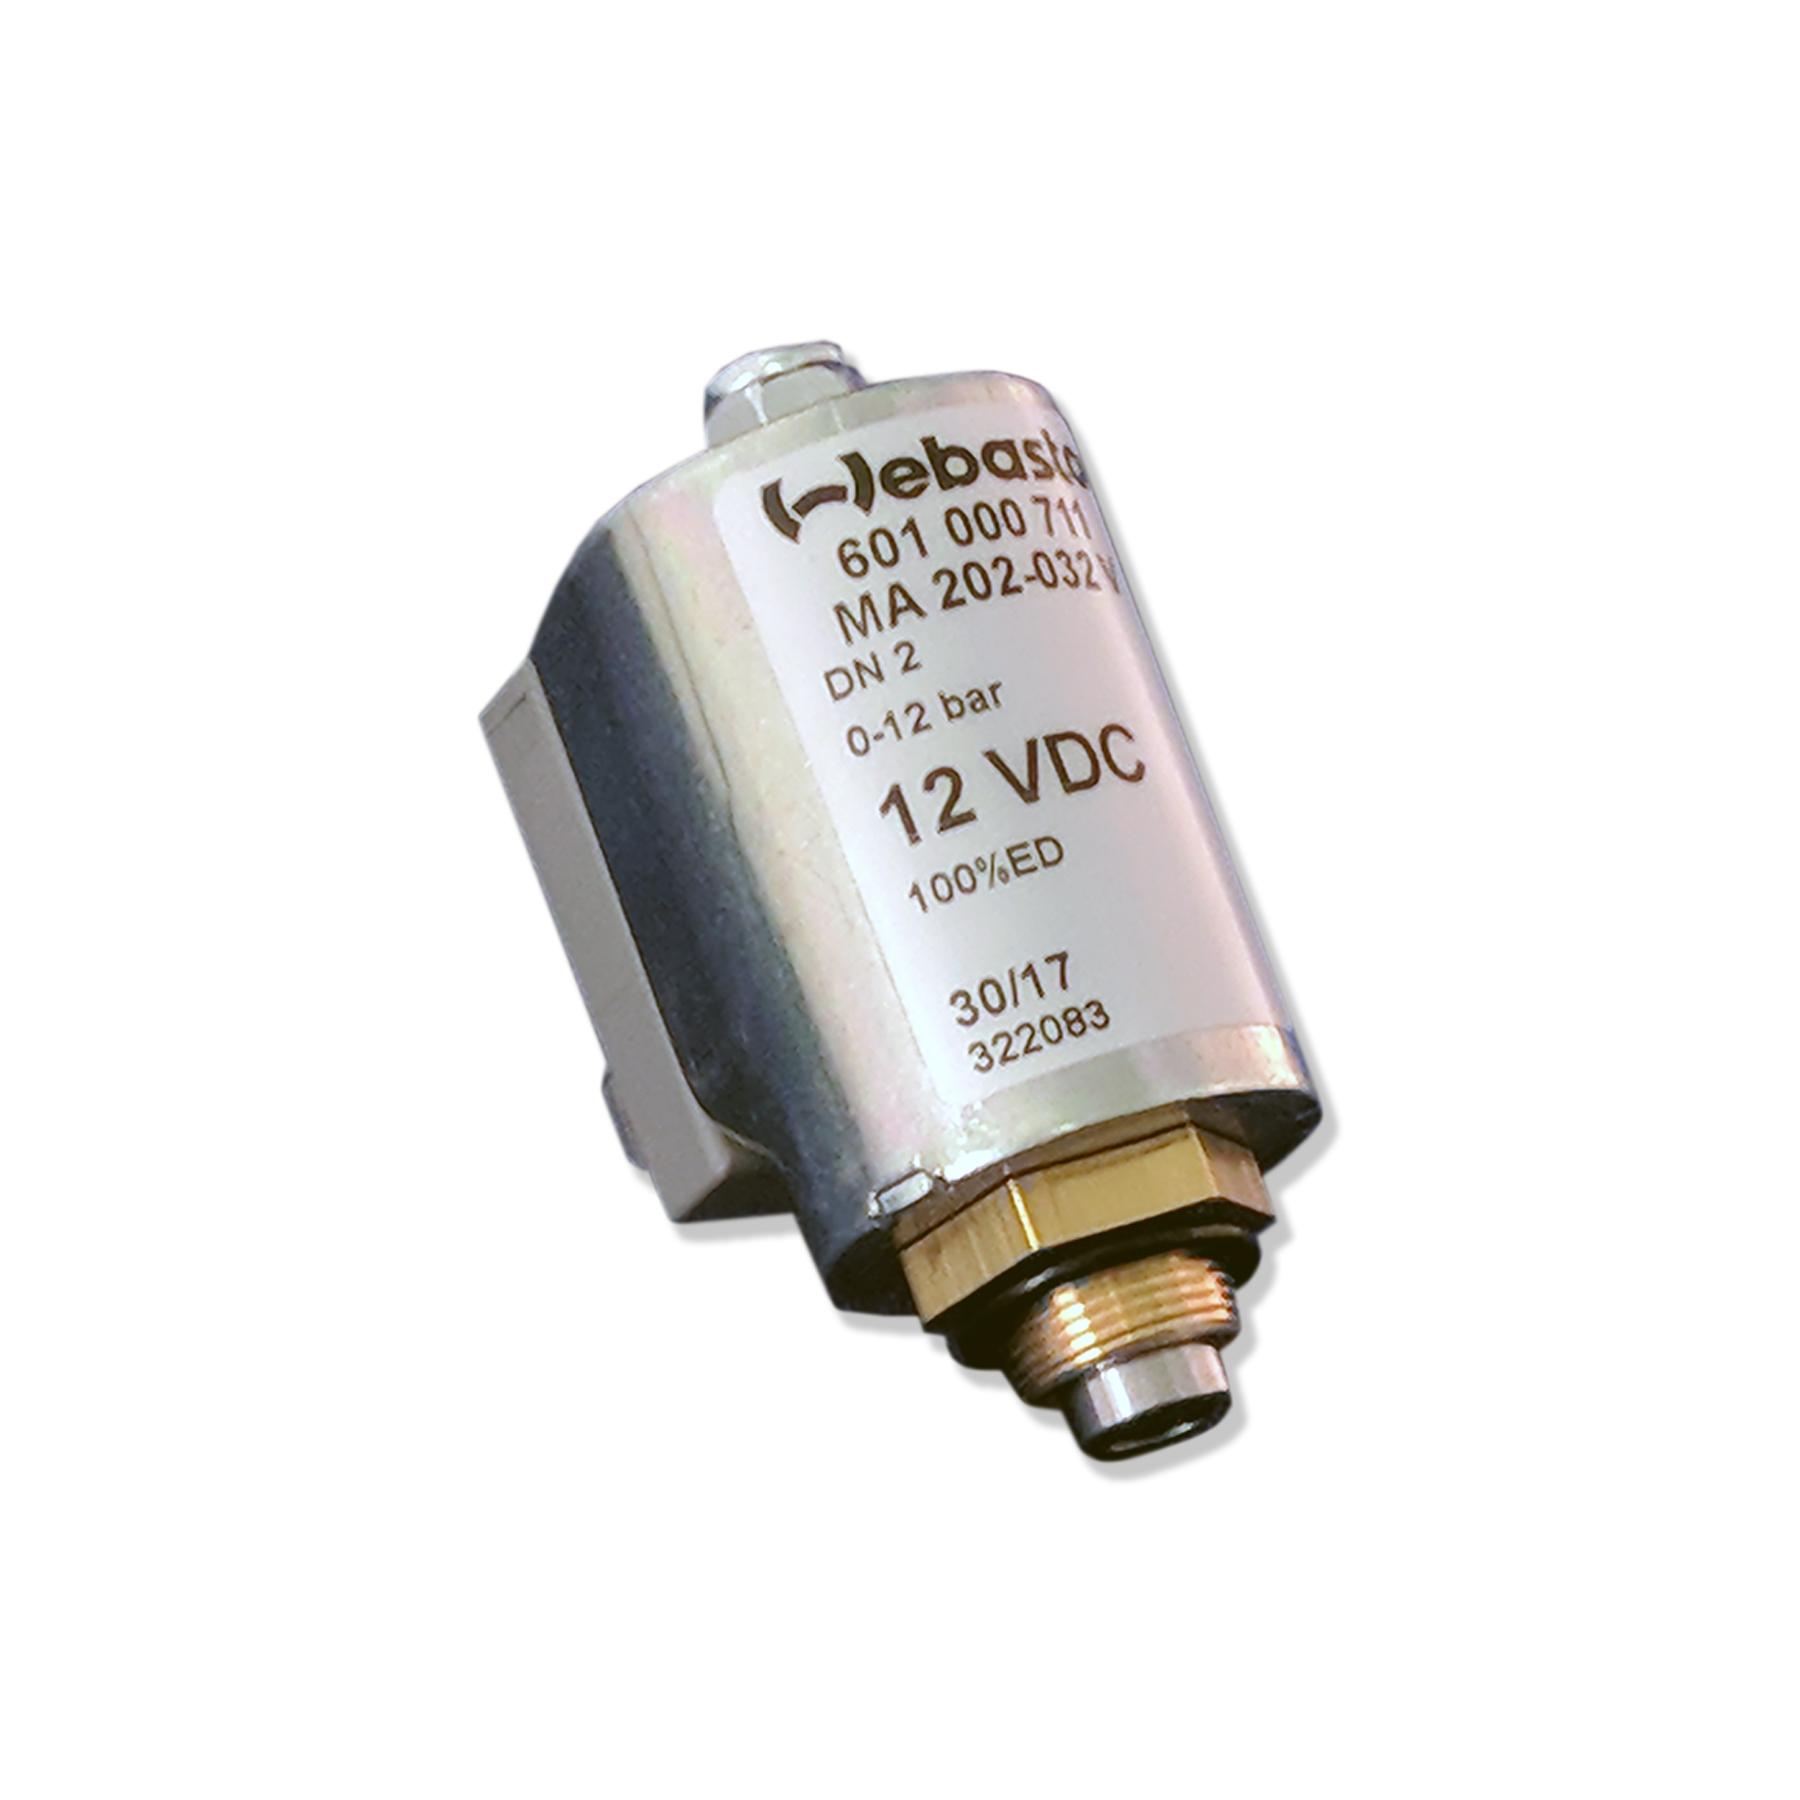 Webasto 12 VDC Fuel Solenoid Valve